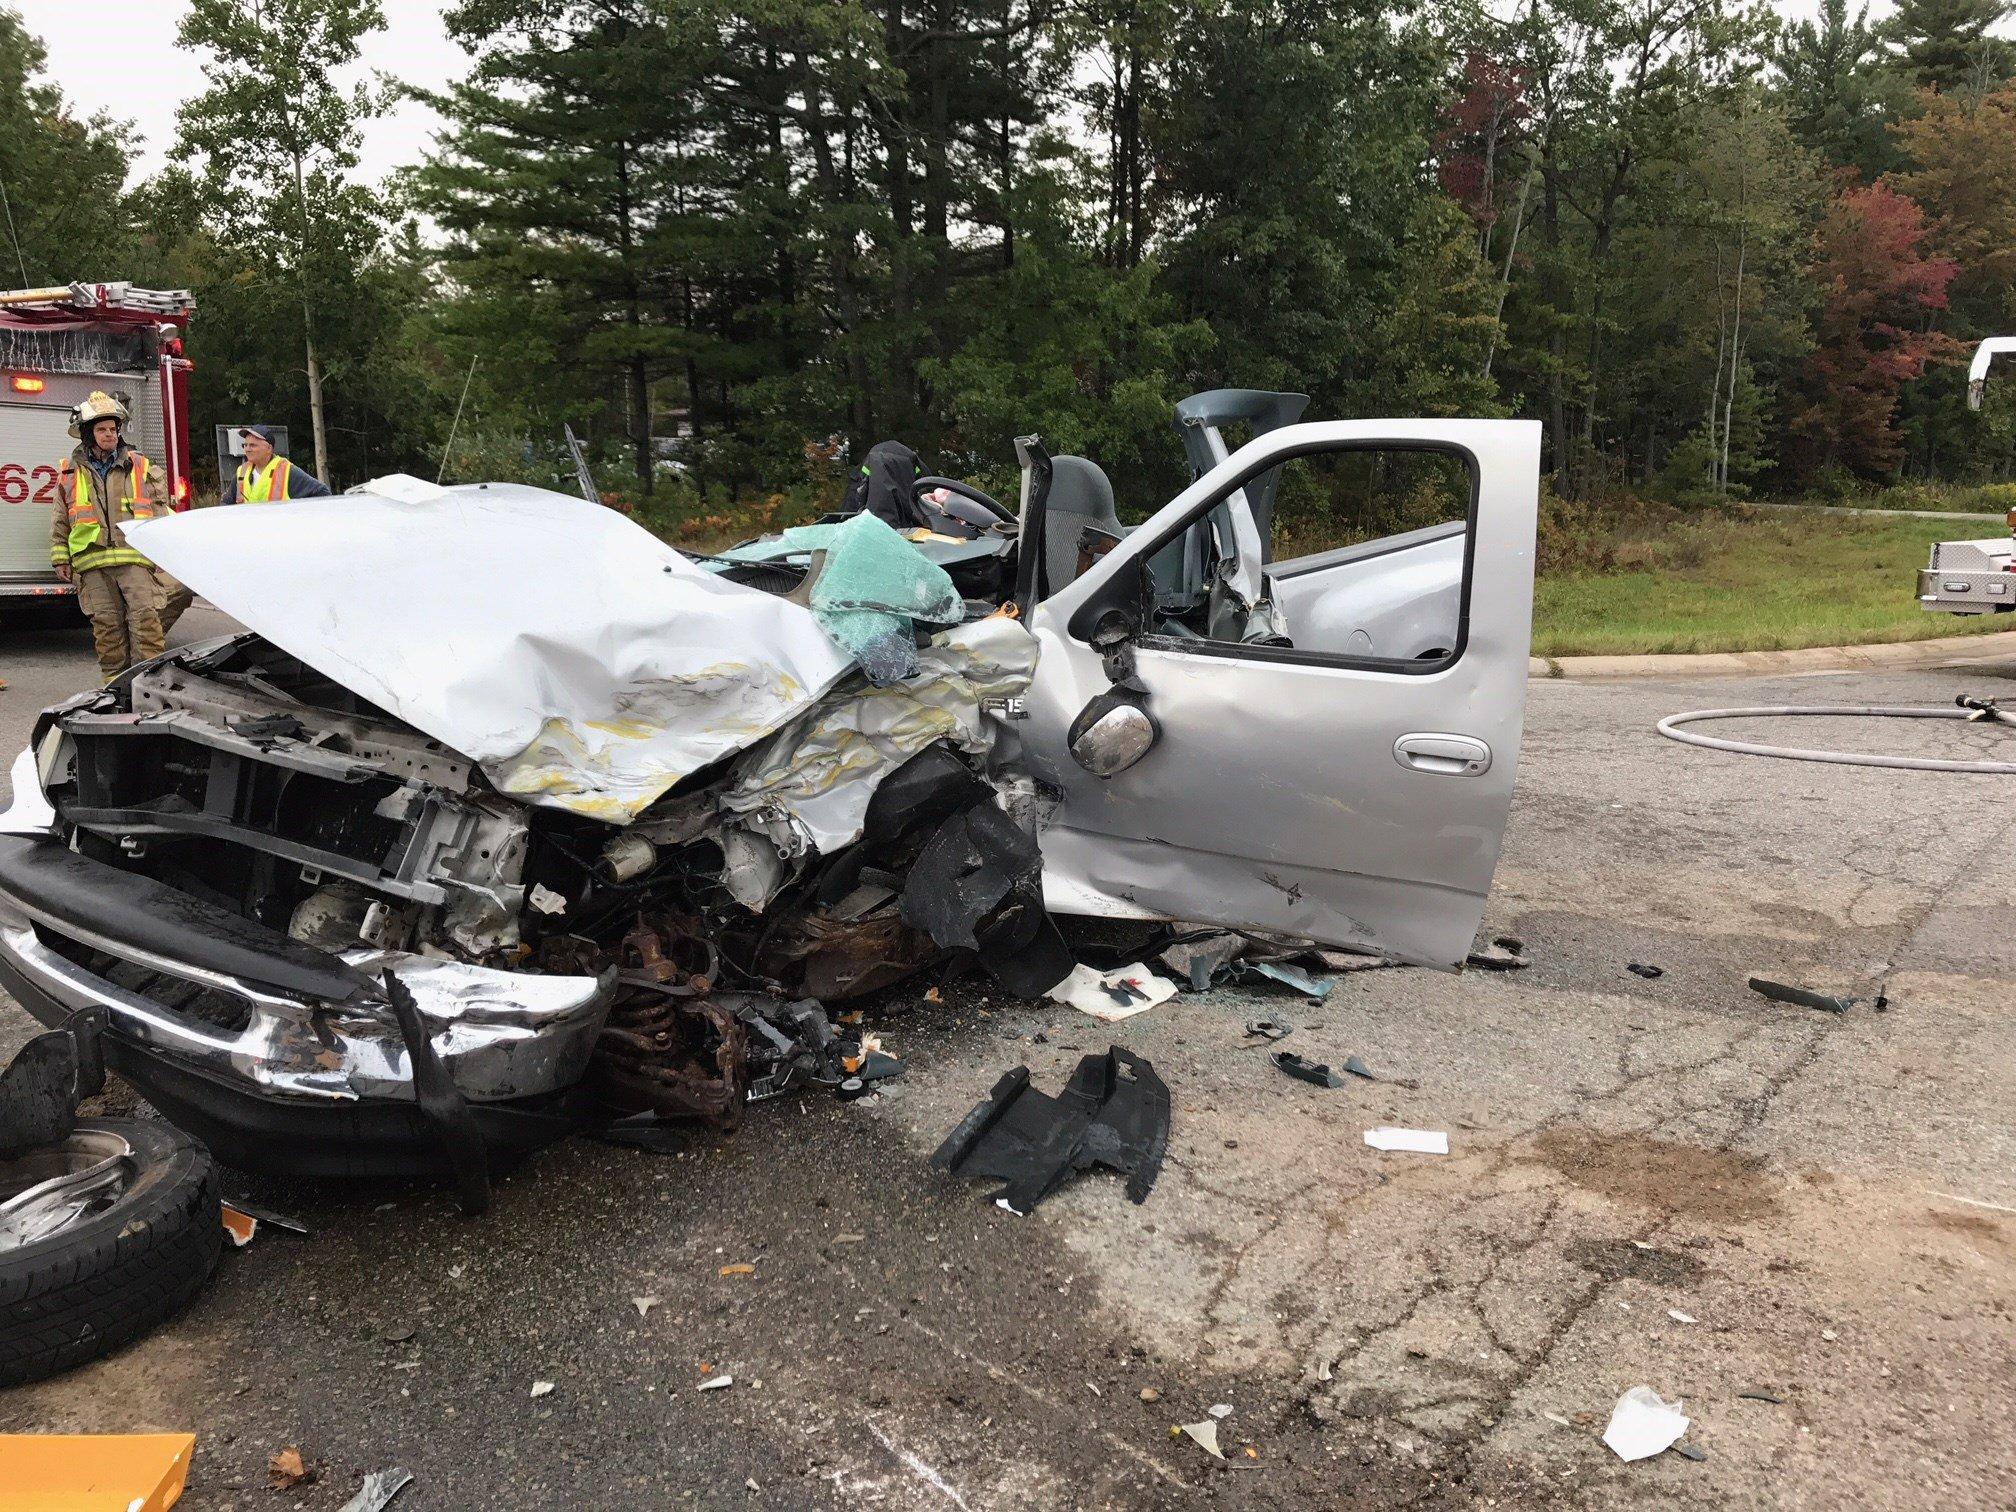 Truck driver hurt in school bus accident - WNEM TV 5